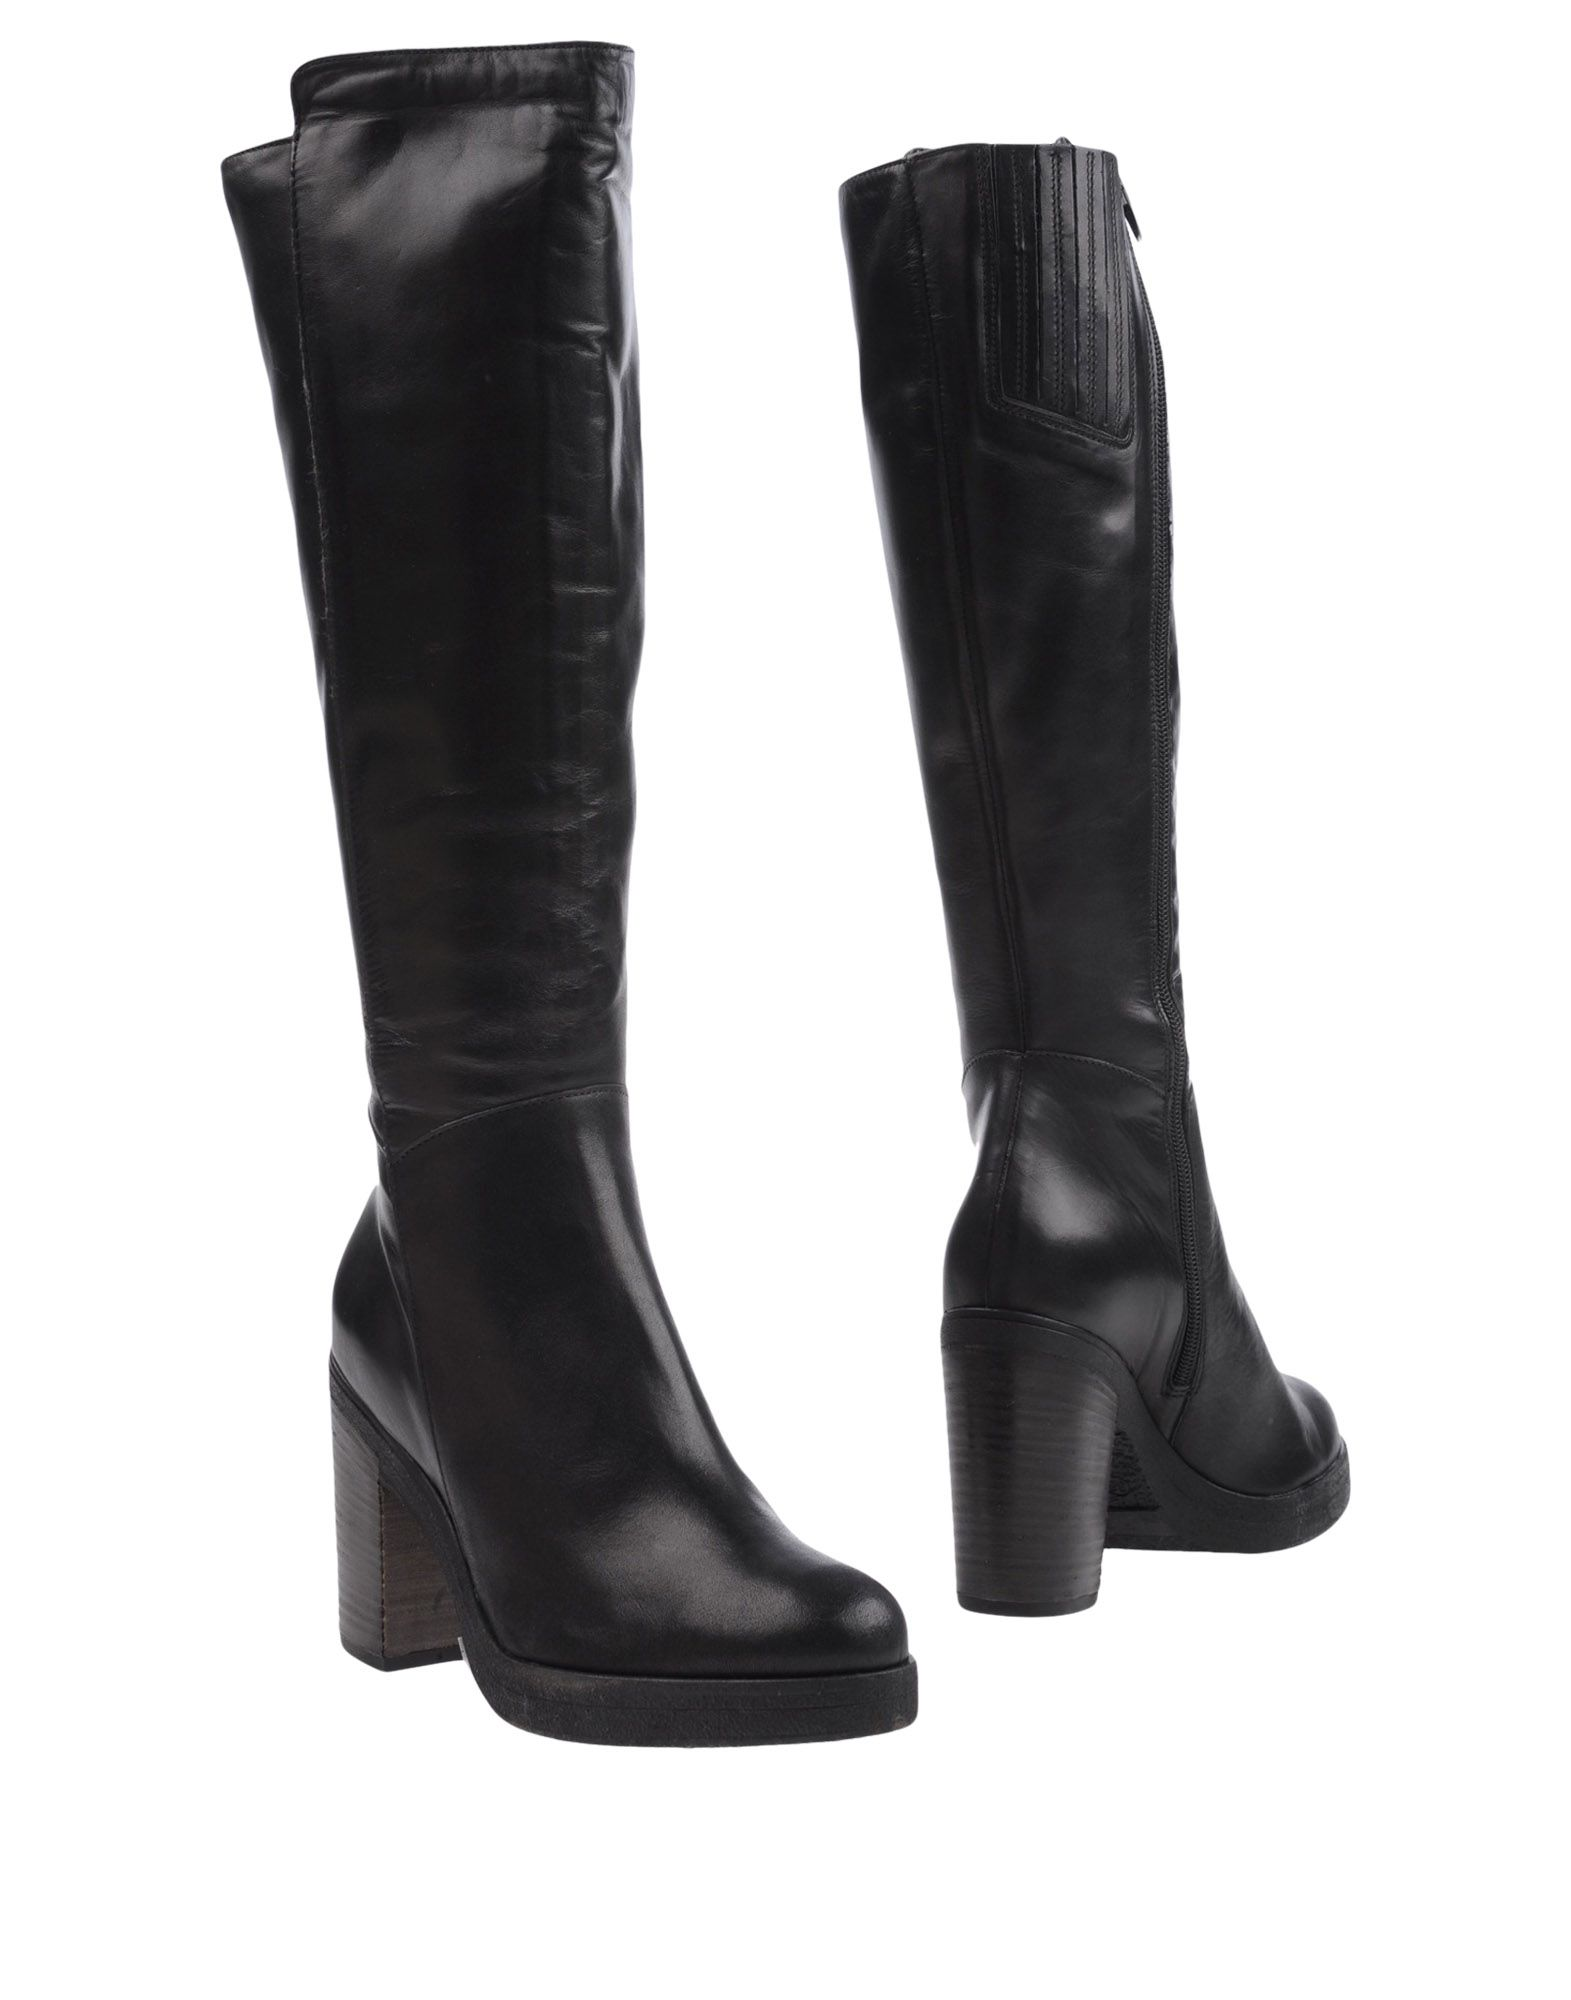 Paola Ferri aussehende Stiefel Damen  11225627XTGut aussehende Ferri strapazierfähige Schuhe 7aba81